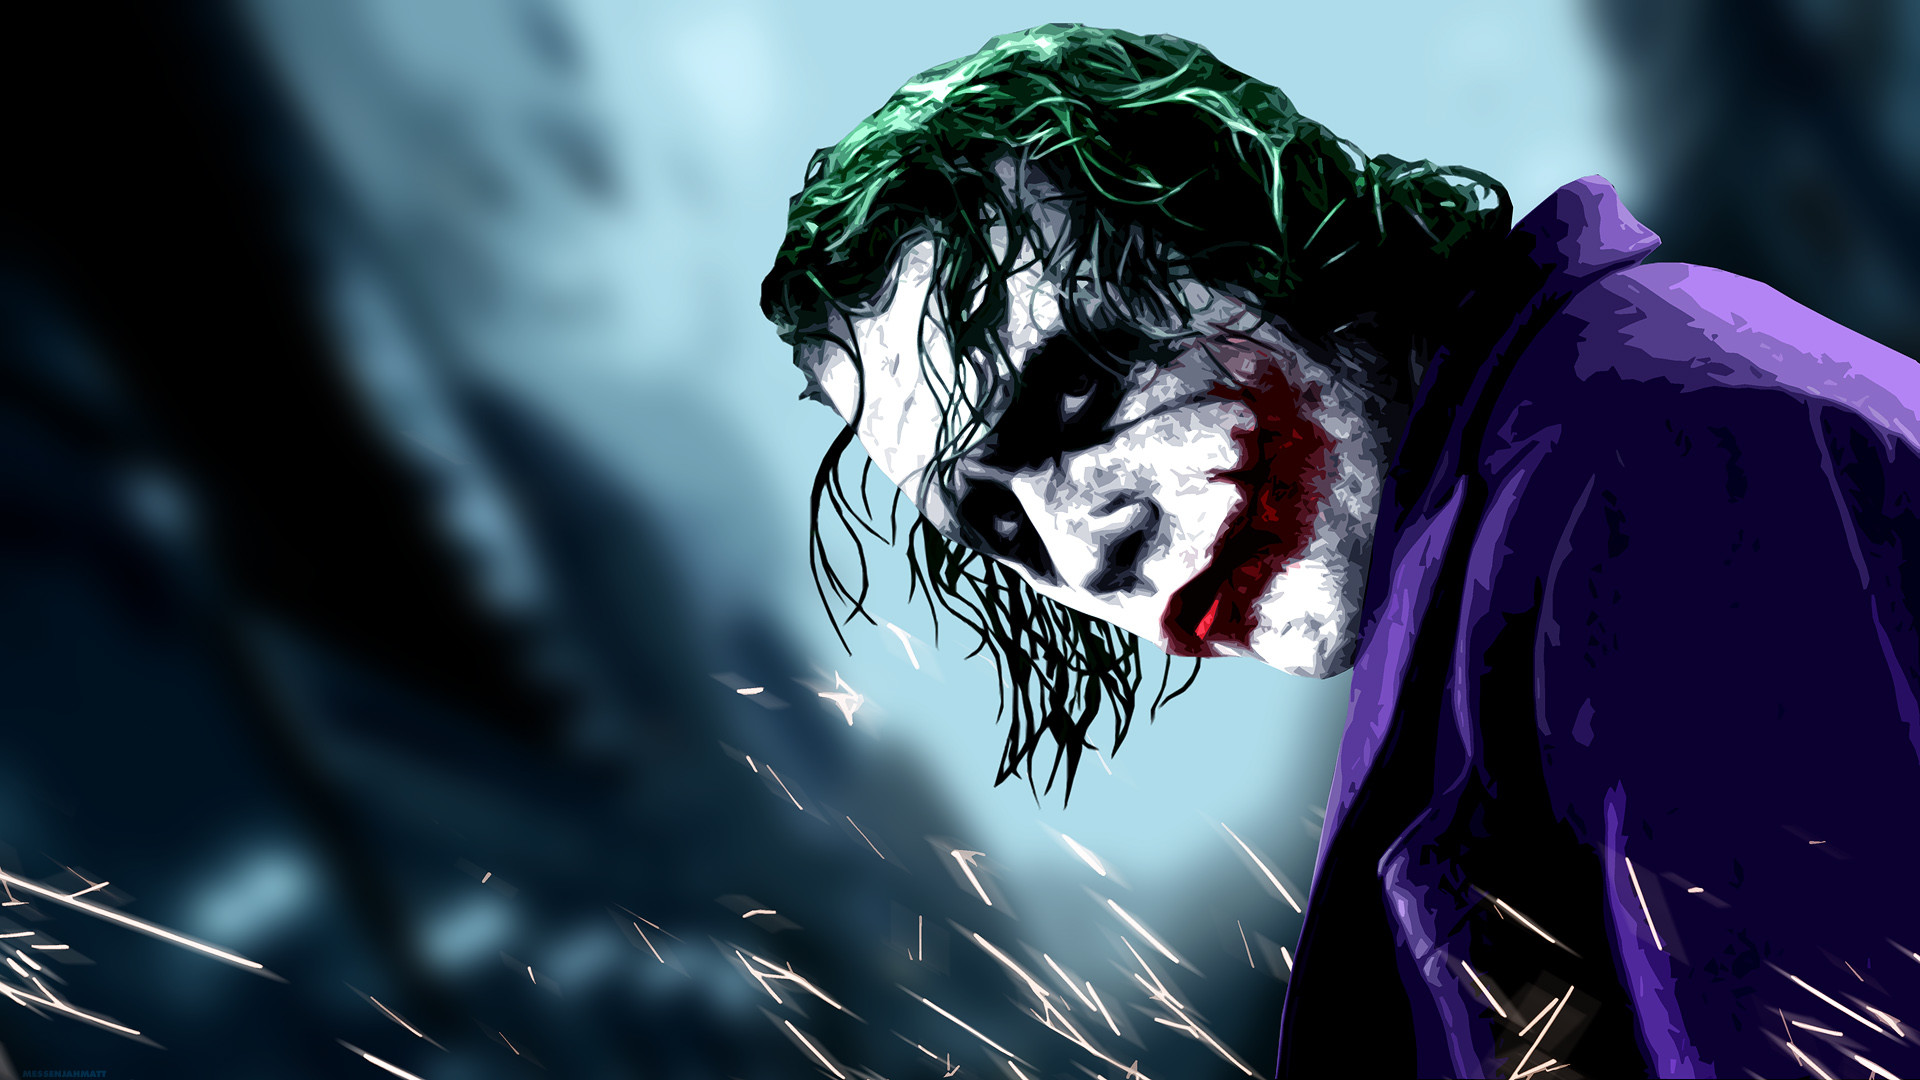 Joker HD Wallpaper | Joker Pictures | Cool Wallpapers